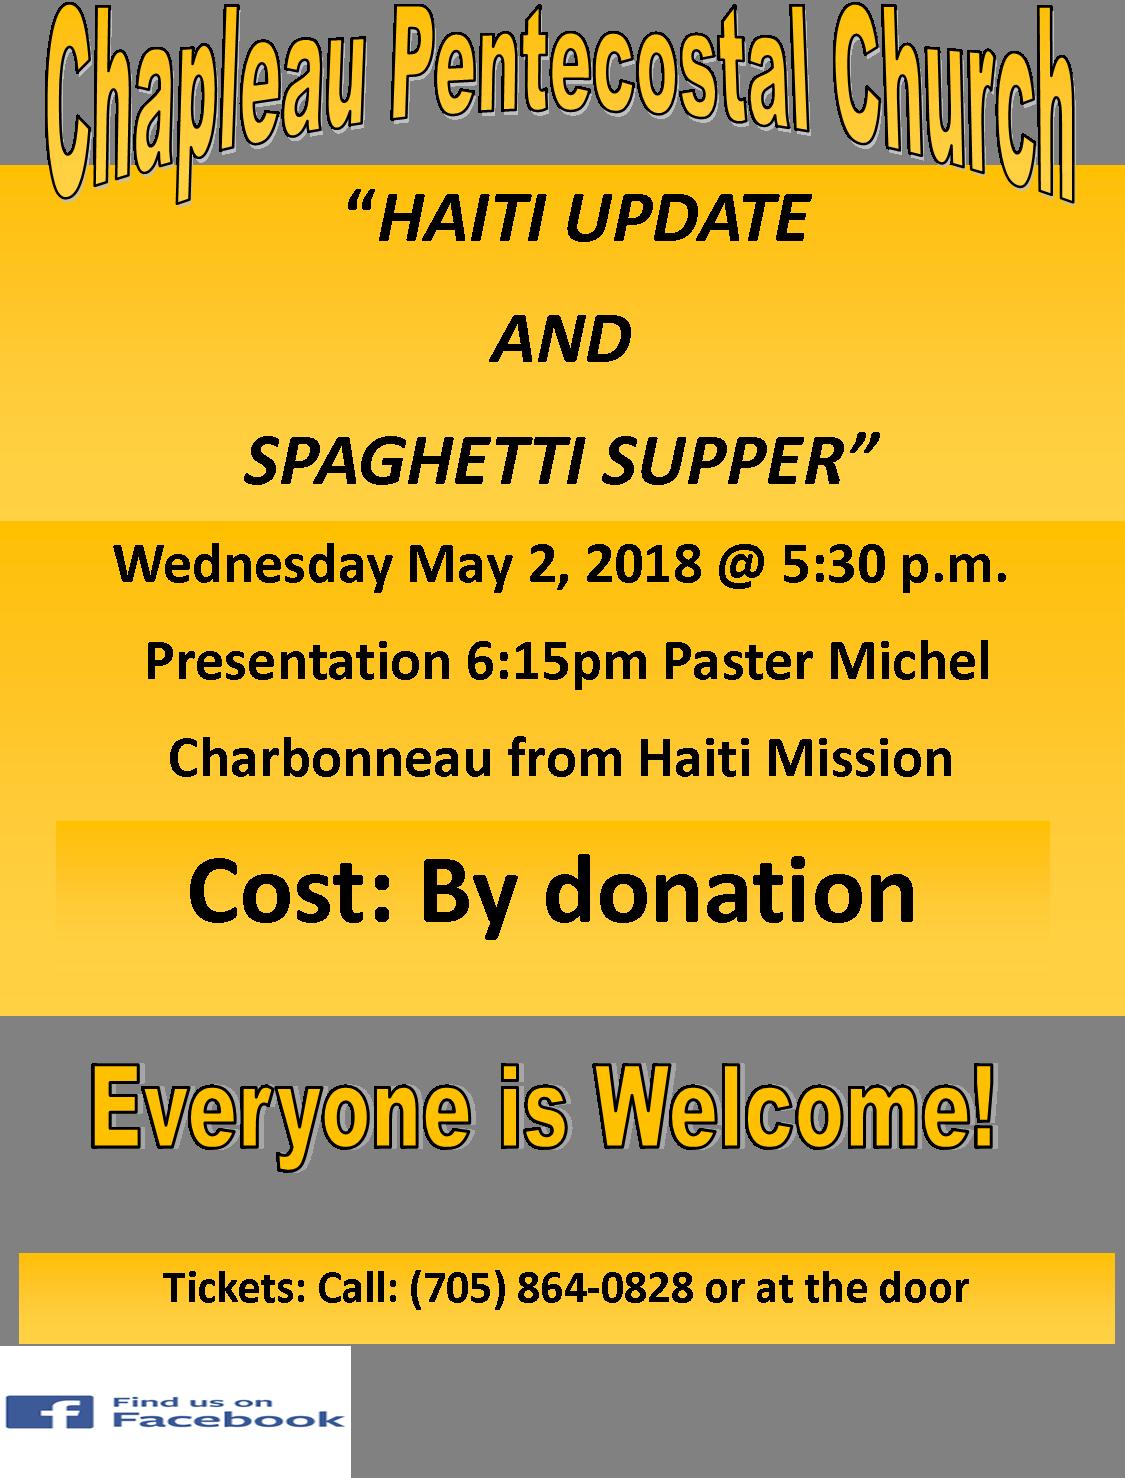 chapleau pentecostl church spaghetti supper may 2 2018.png